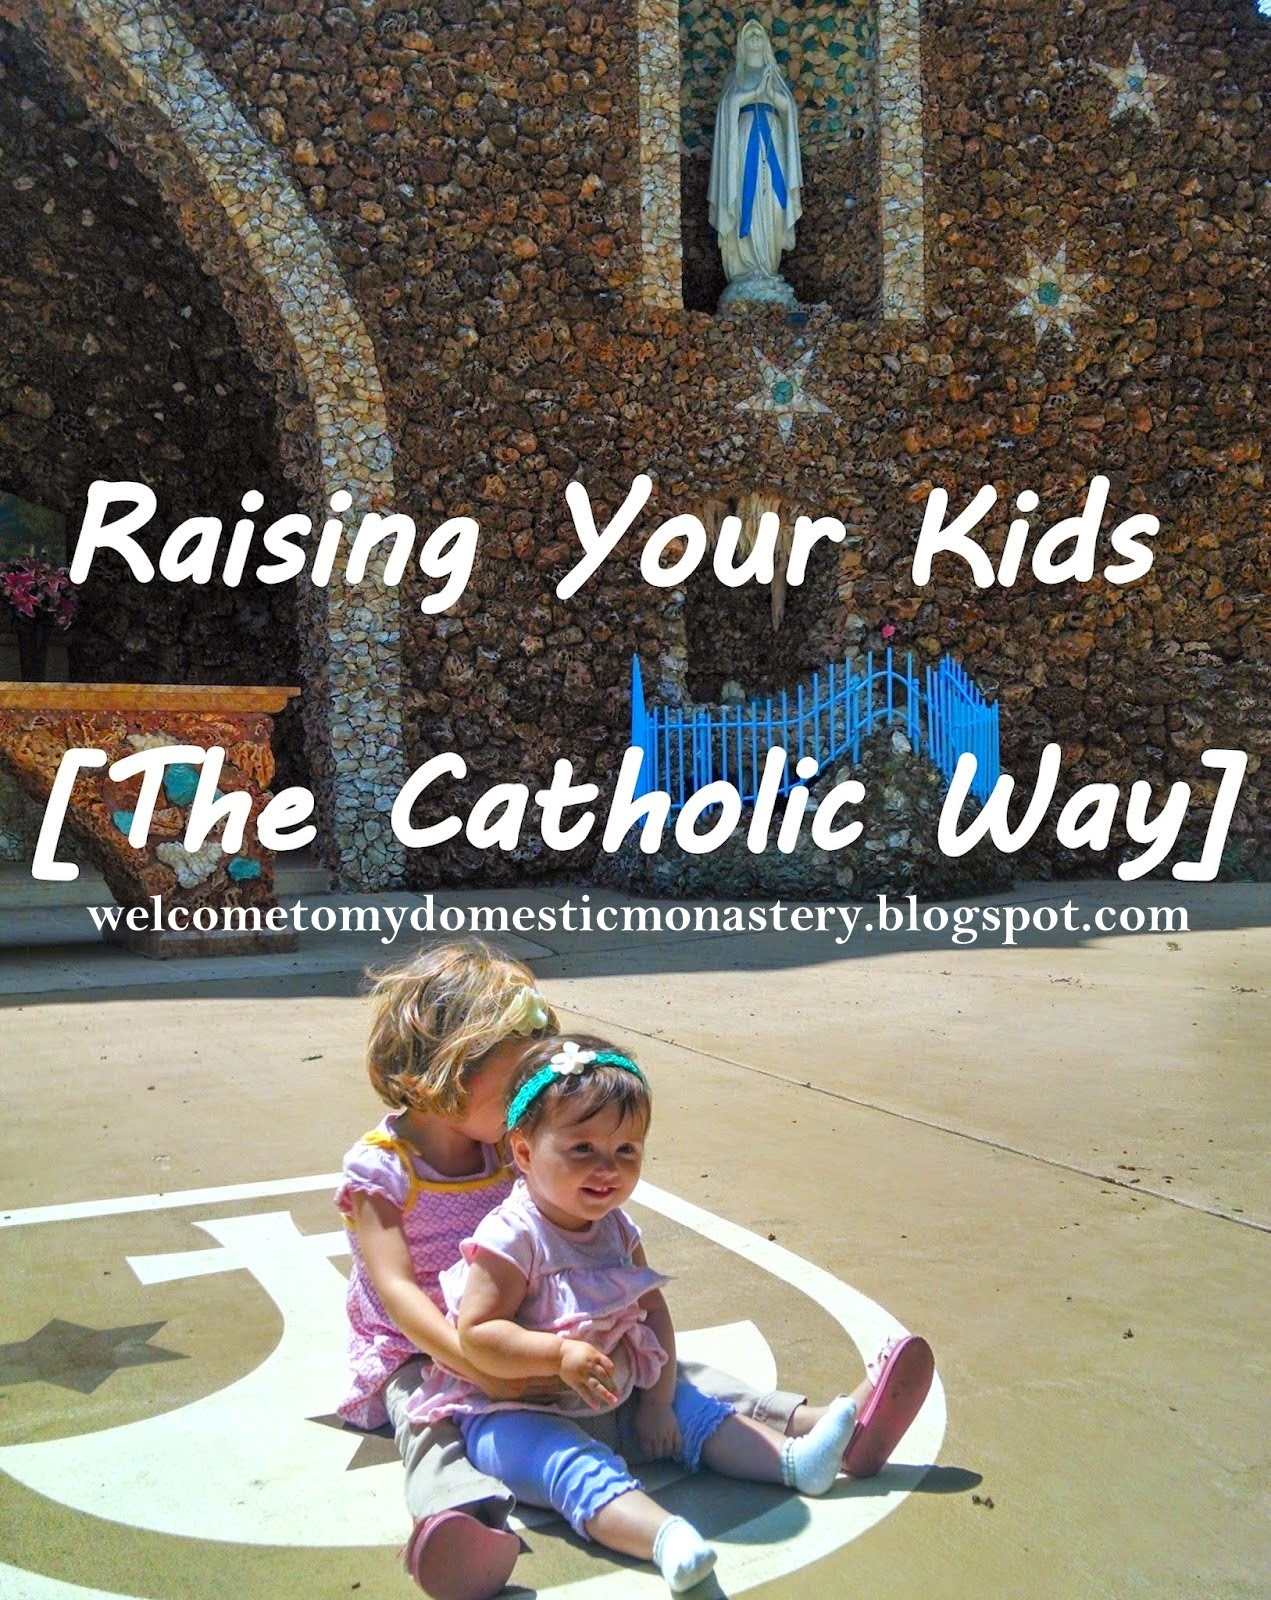 My Domestic Monastery: Raising Your Kids [The Catholic Way] - Taking